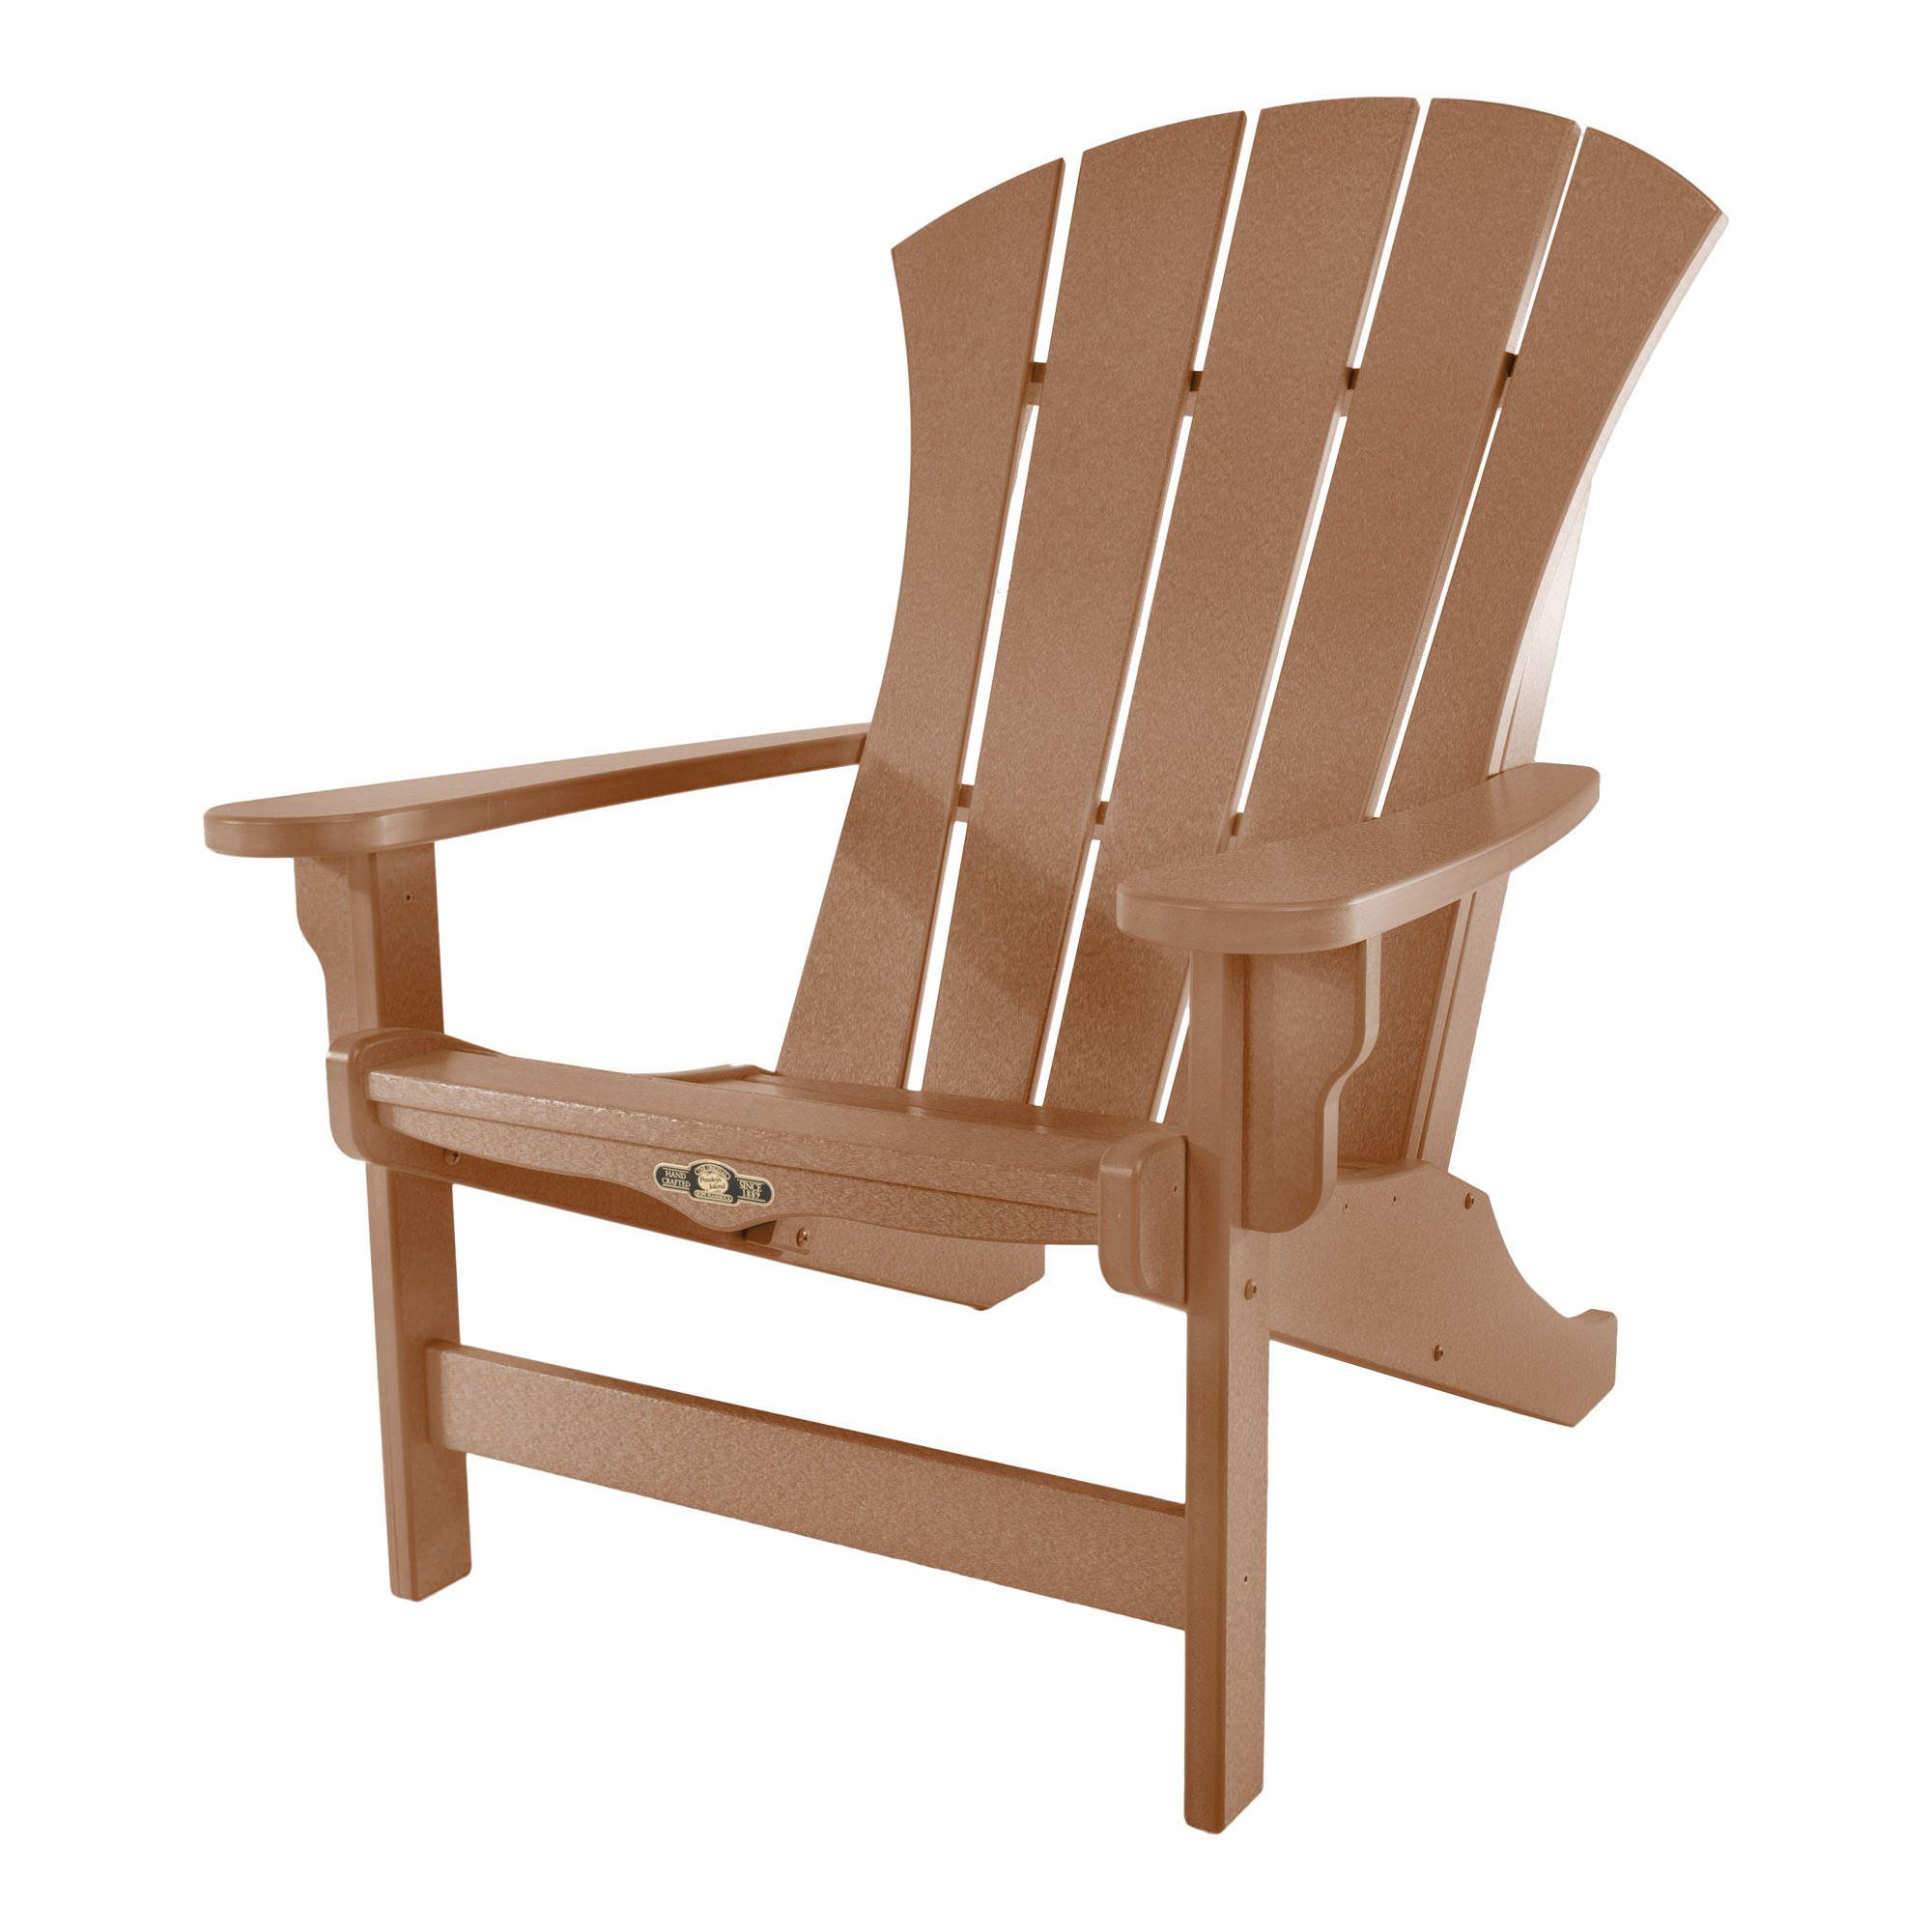 Adirondack Cedar Chairs sunrise cedar durawood adirondack chair|pawleys island